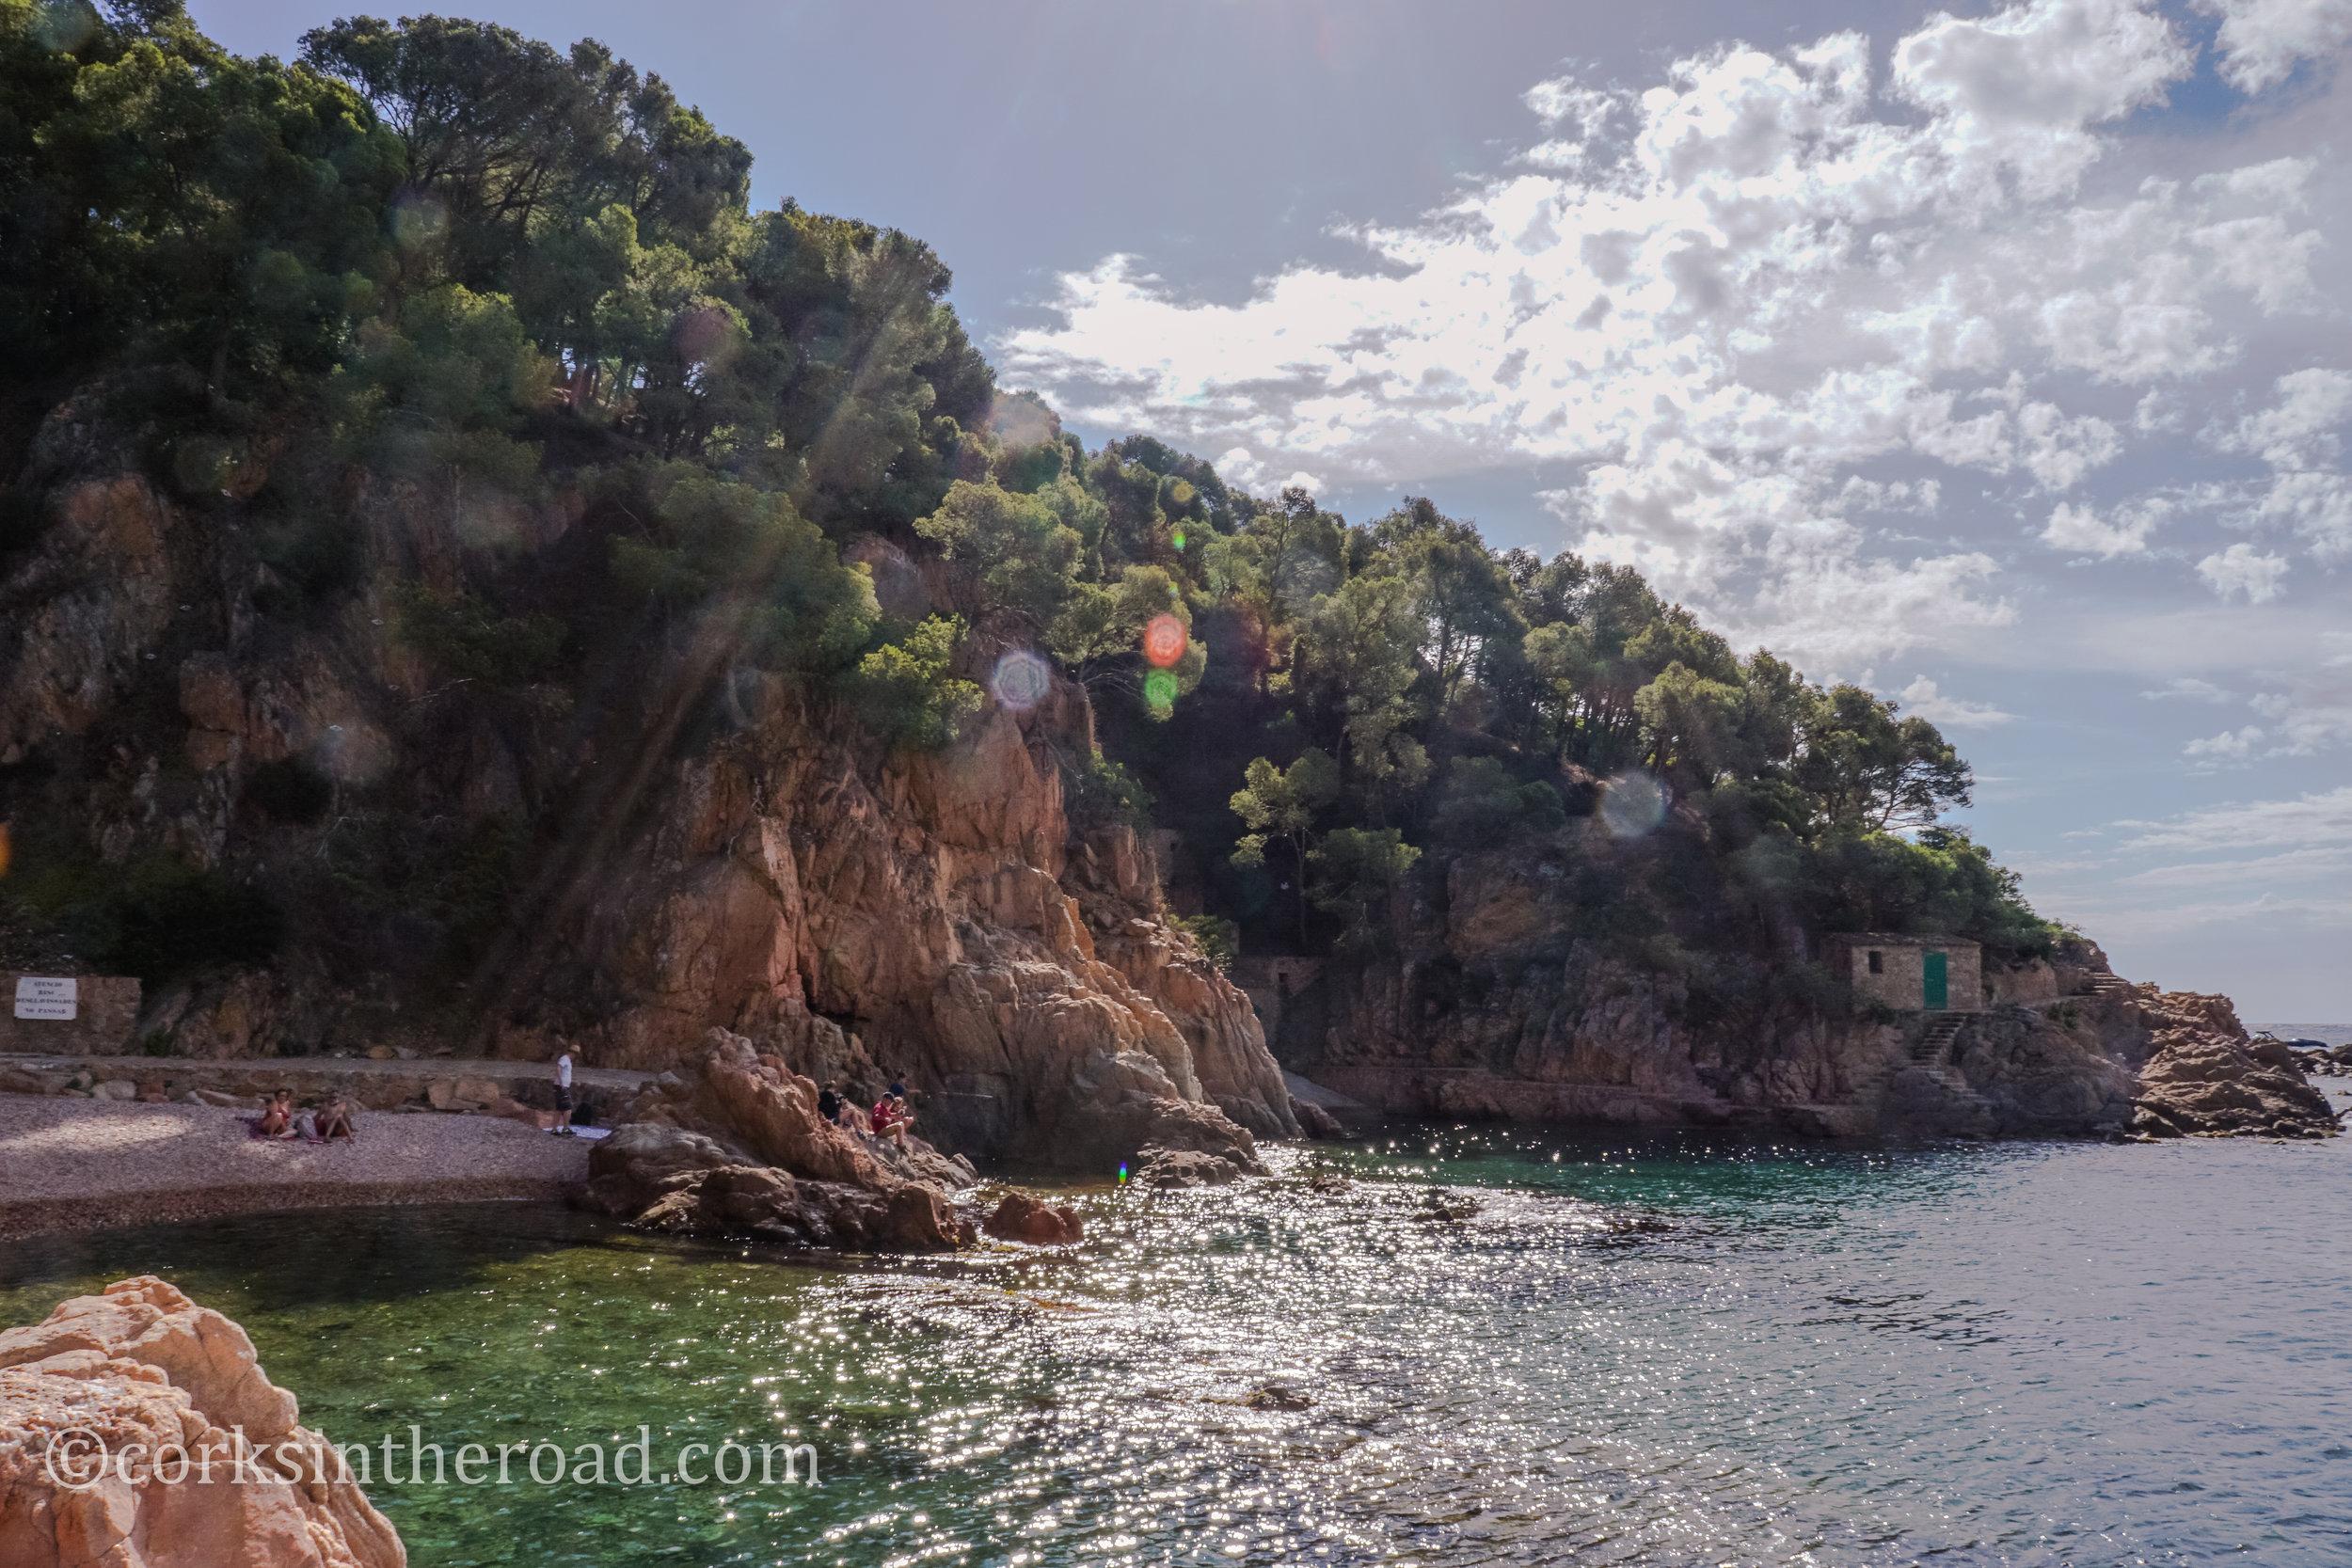 20160810Barcelona, Corksintheroad, Costa Brava, Costa Brava Landscape-6.jpg